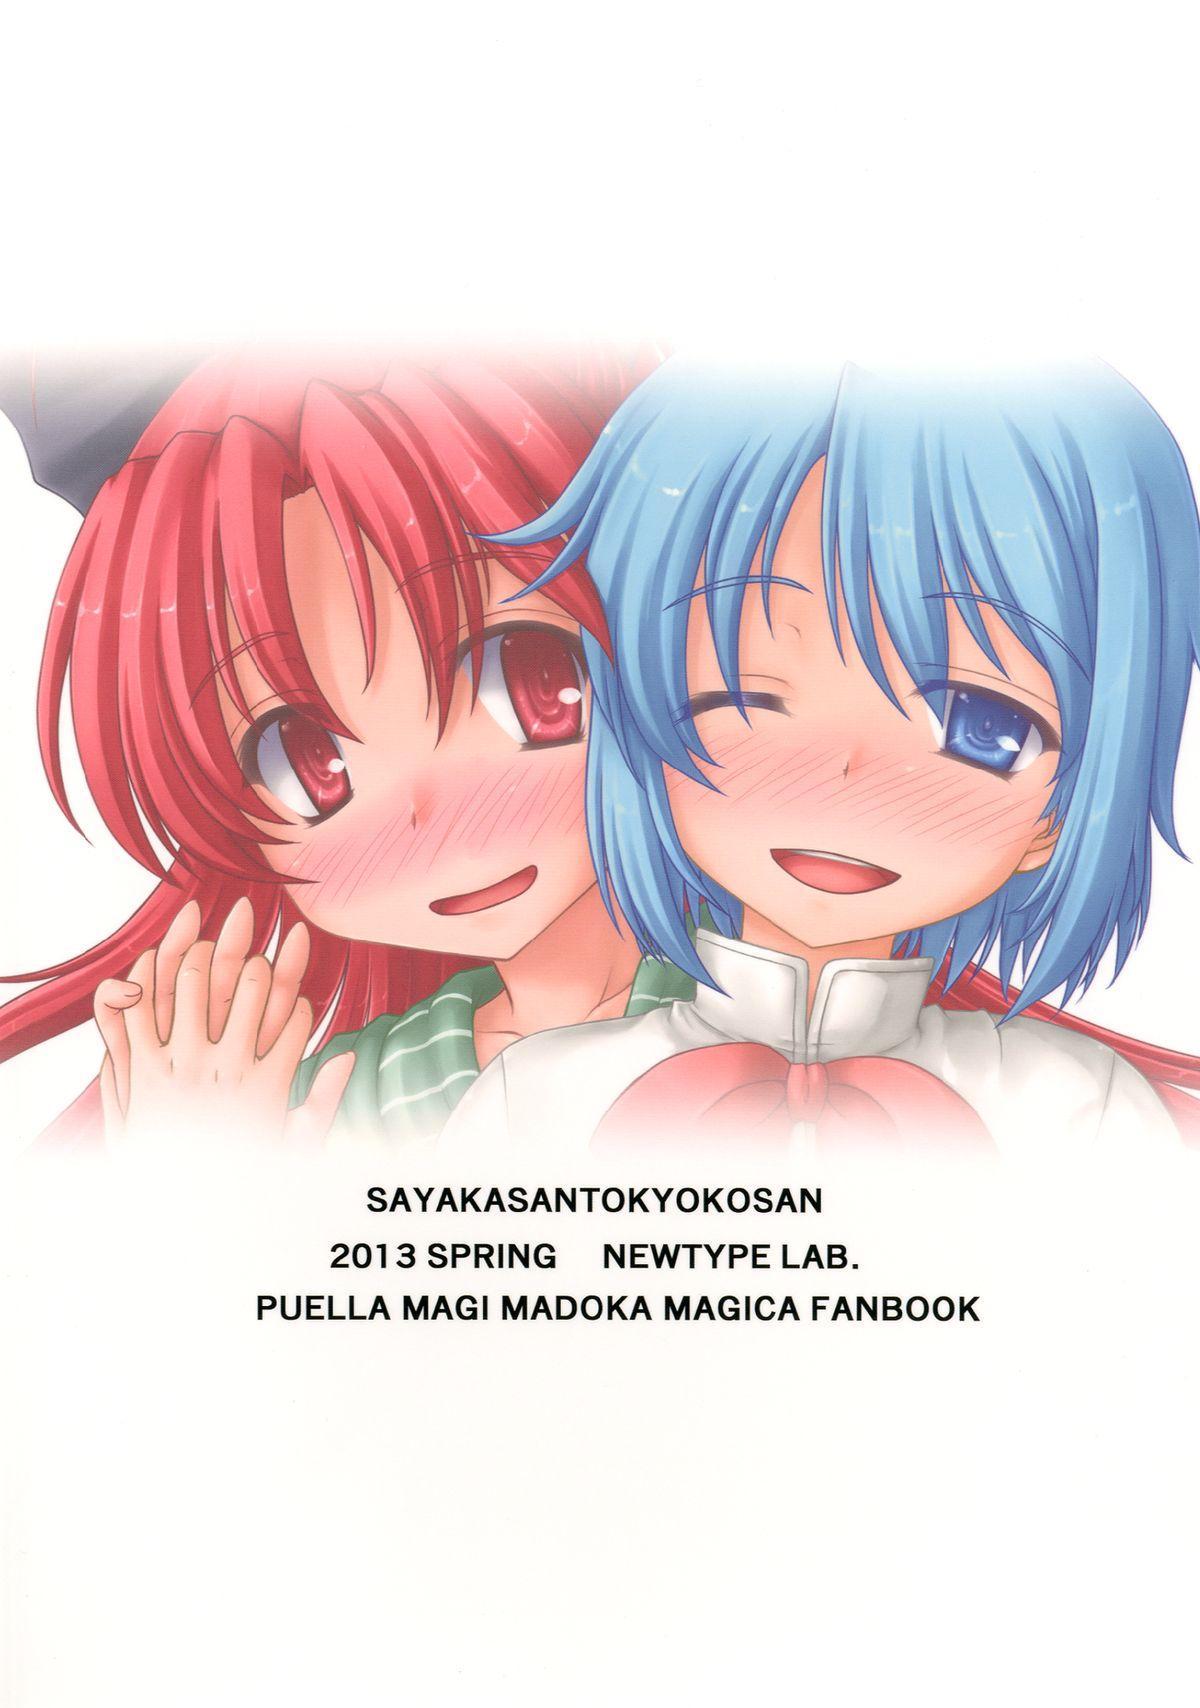 (SHT2013 Haru) [Newtype Kenkyuujo (Kotowari)] Sayaka-san to Kyouko-san (Puella Magi Madoka Magica) 31